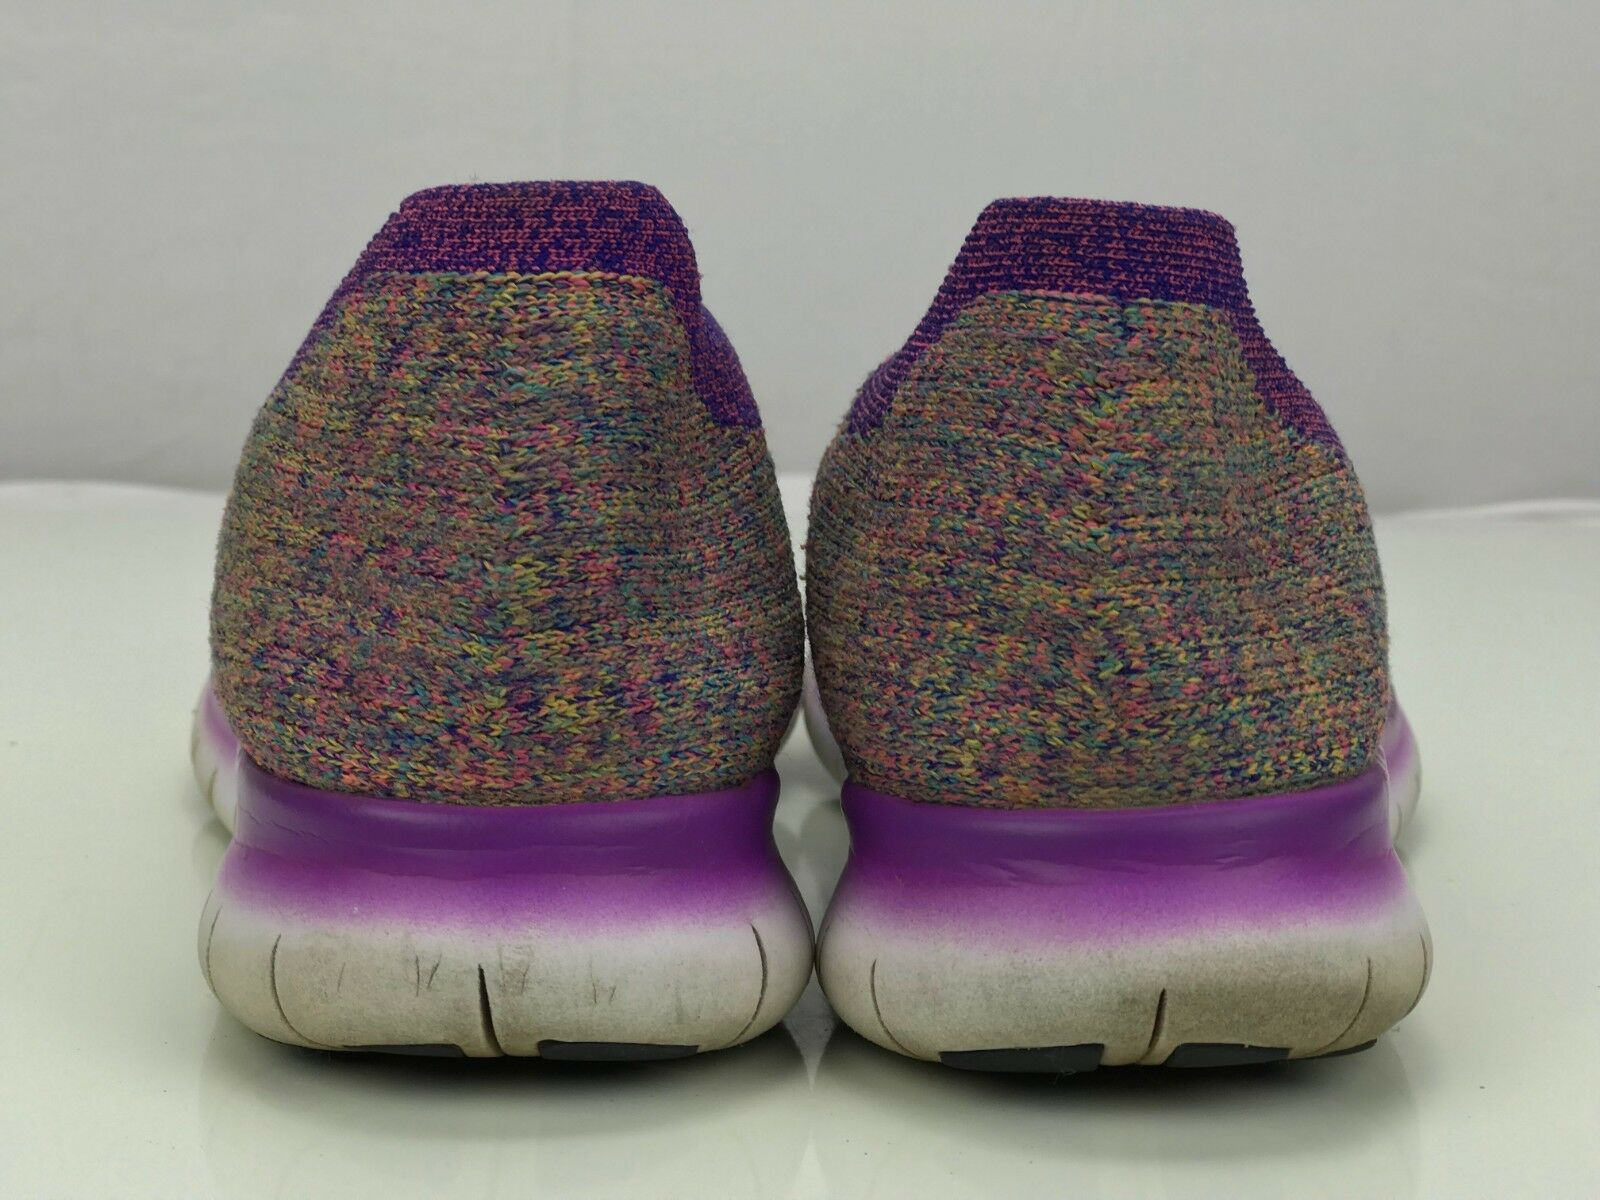 wholesale dealer 9c461 f47ed ... Nike Free Free Free RN Flyknit Marathon Running Shoes Sneakers - Womens  7.5 Purple Black ...